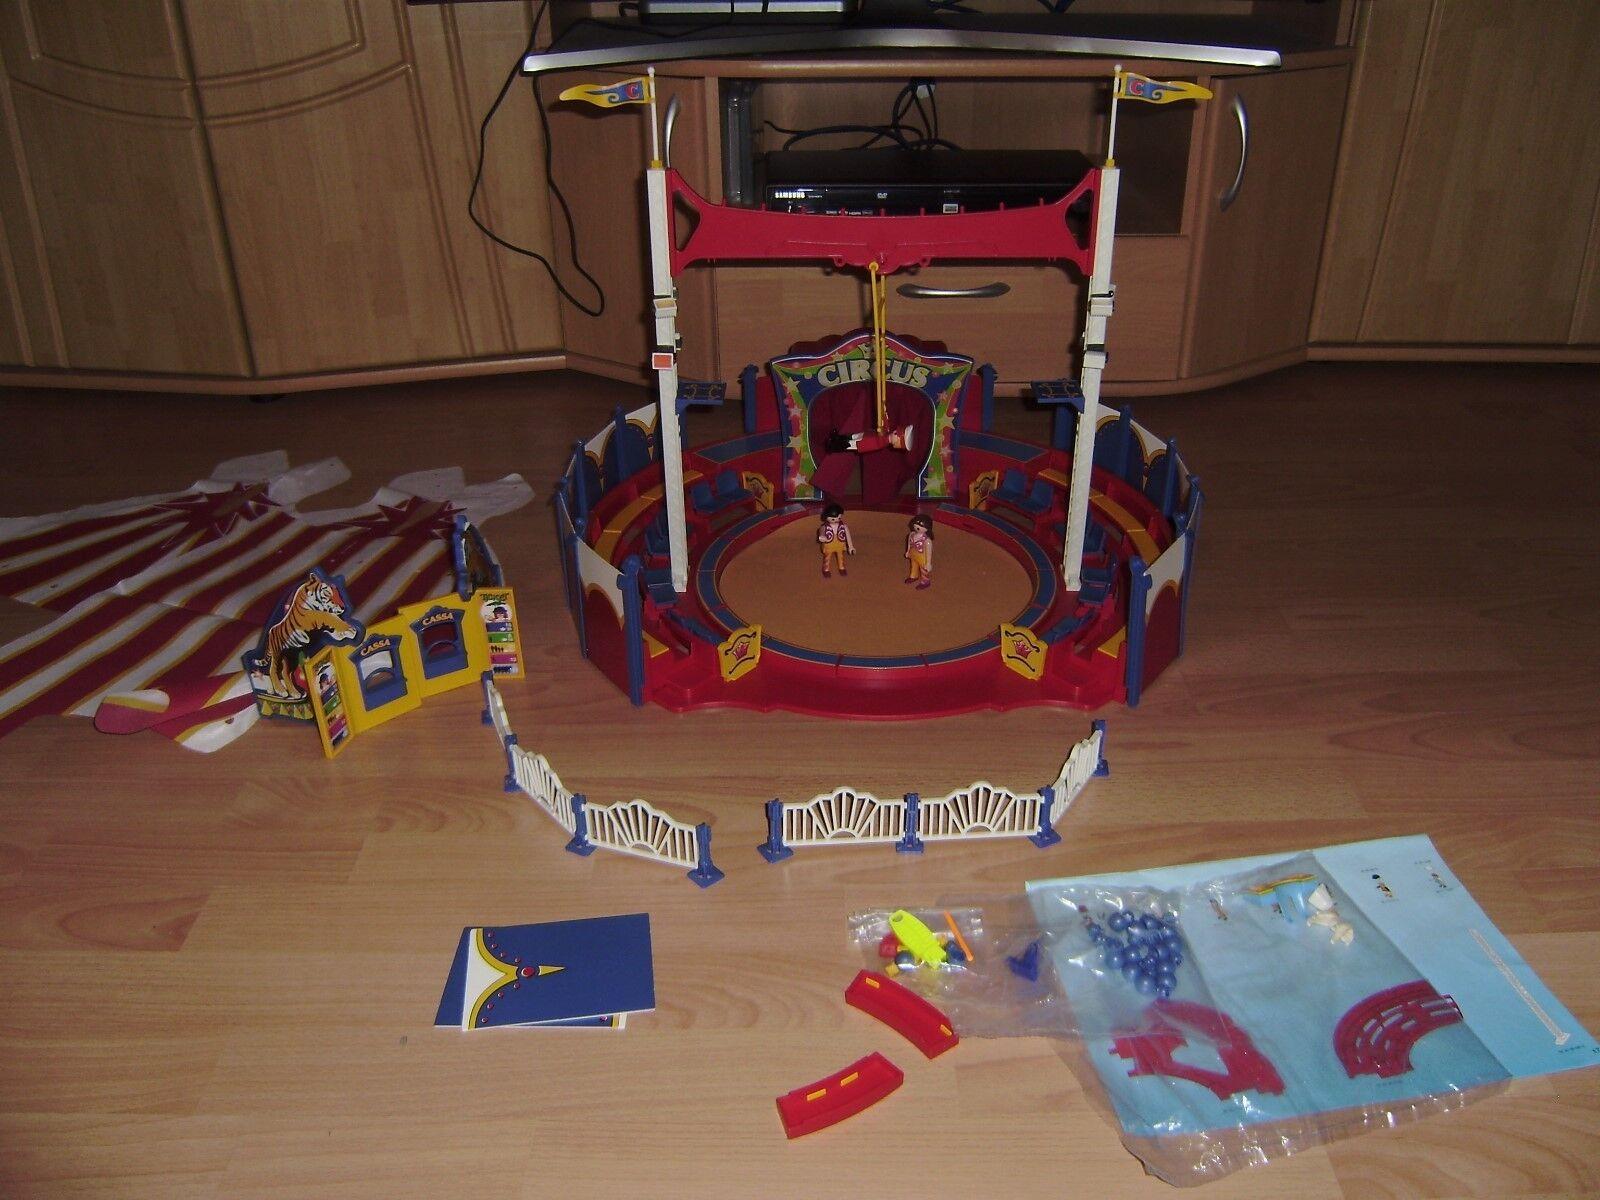 Playmobil 4230 - großes Zirkuszelt mit LED Portal - Zirkus in OVP und Anleitung